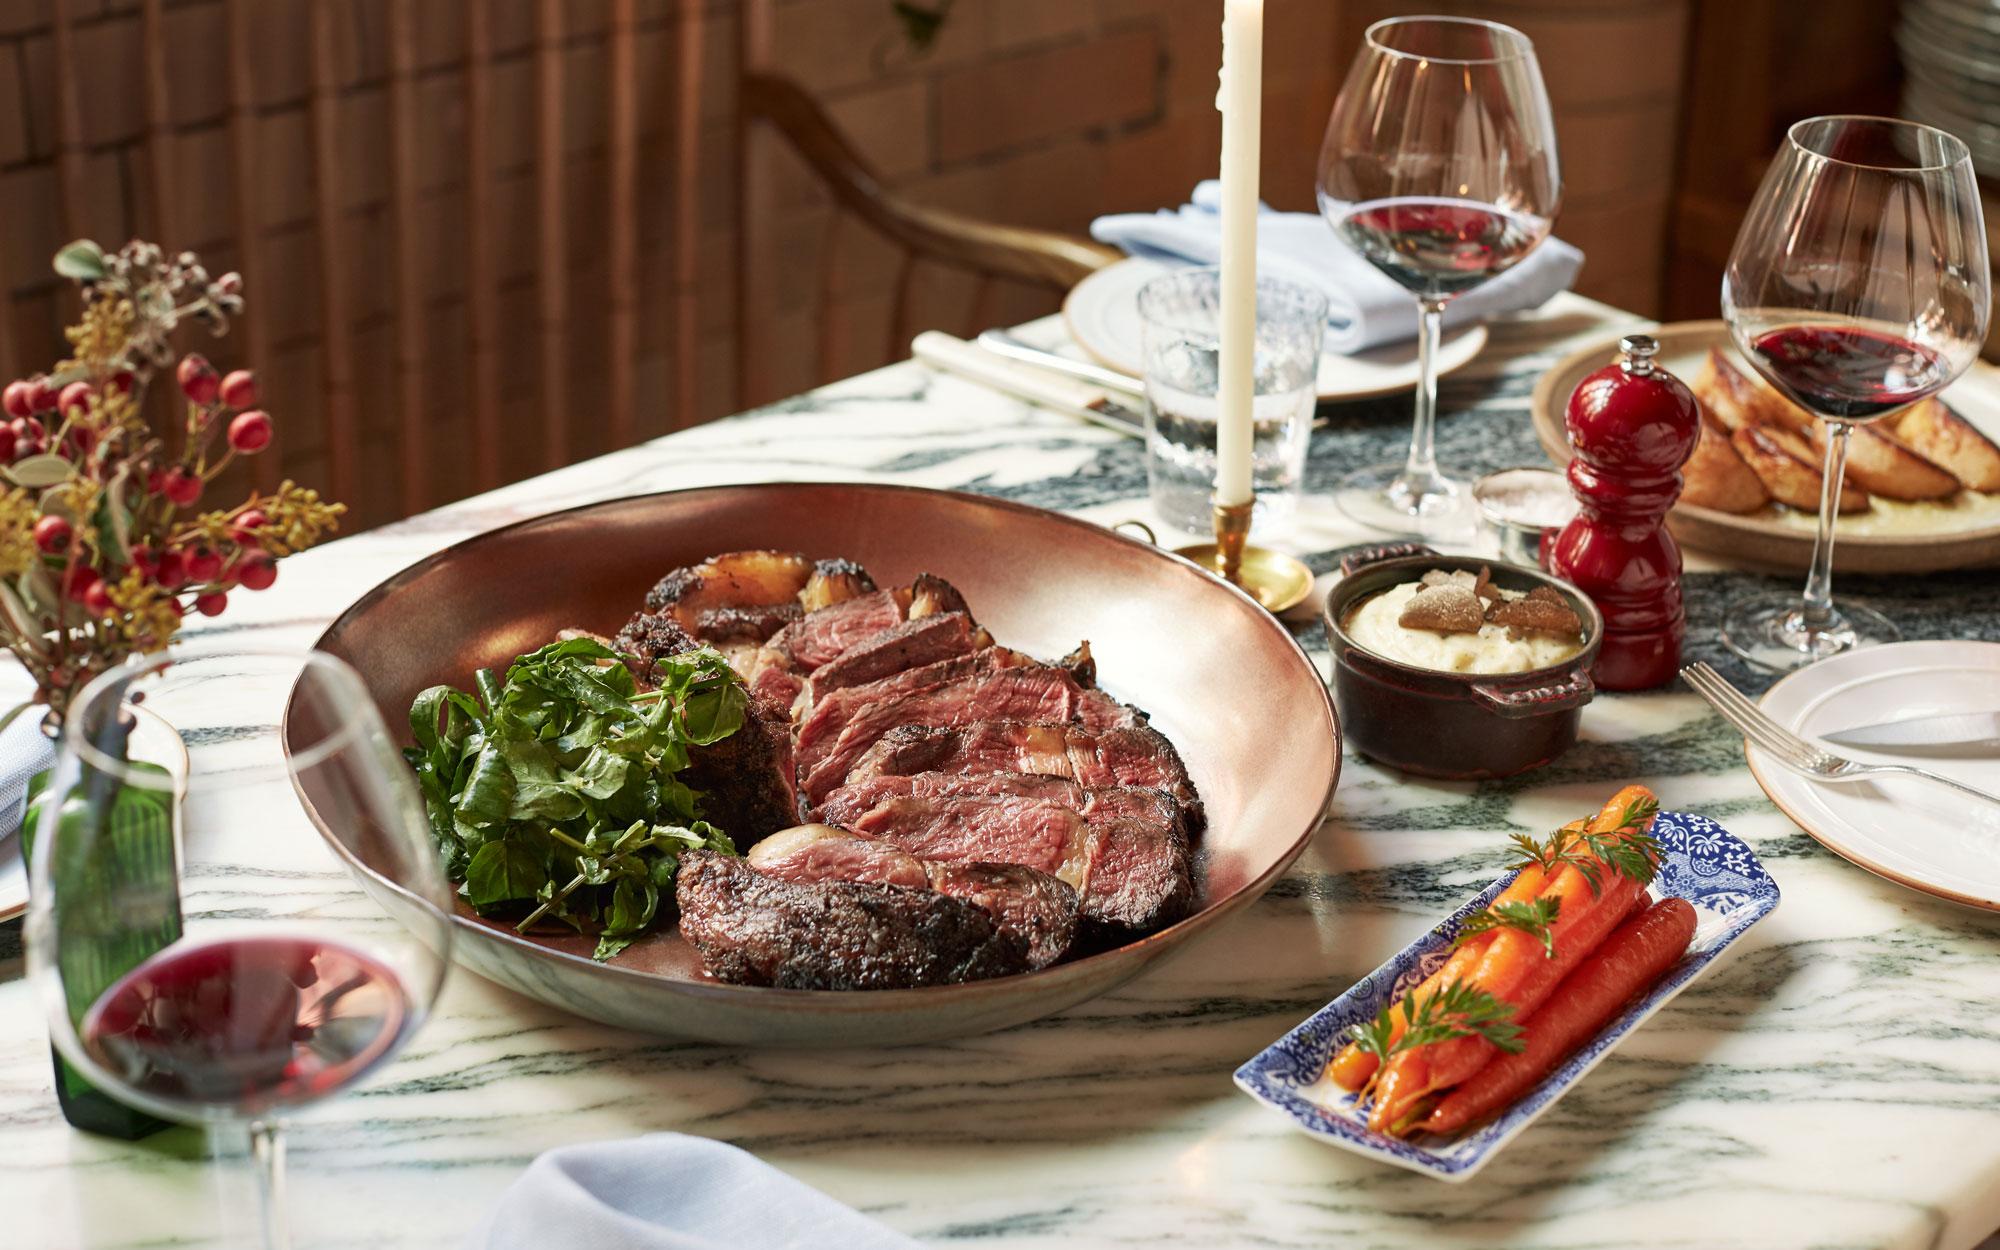 Chiltern Firehouse Xmas feast steak